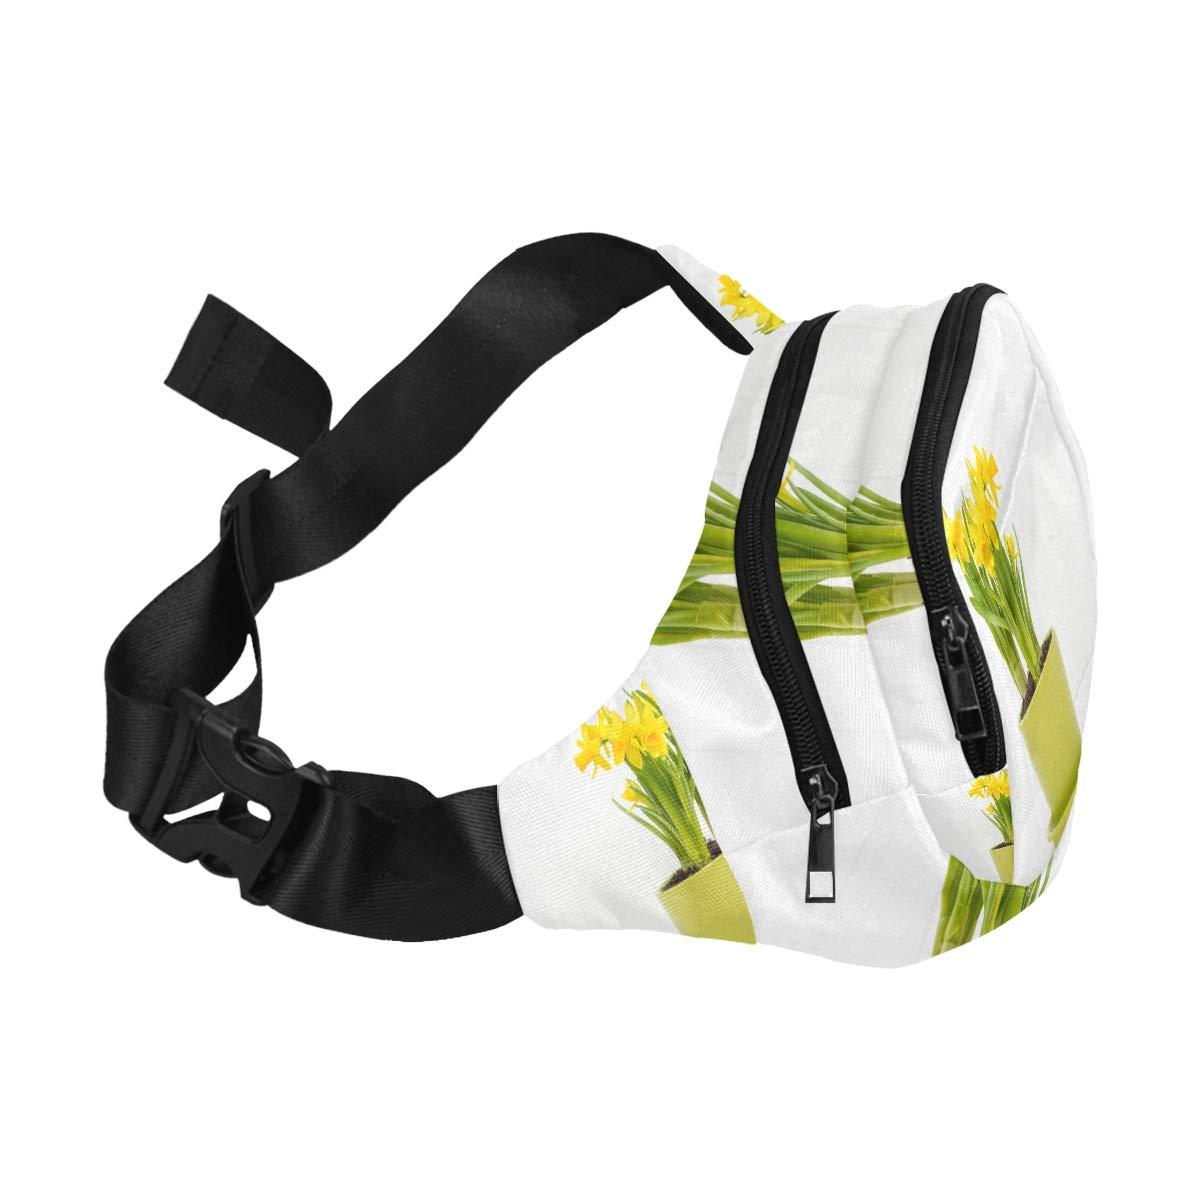 Colorful Flowers In A Ceramic Flowerpot Fenny Packs Waist Bags Adjustable Belt Waterproof Nylon Travel Running Sport Vacation Party For Men Women Boys Girls Kids